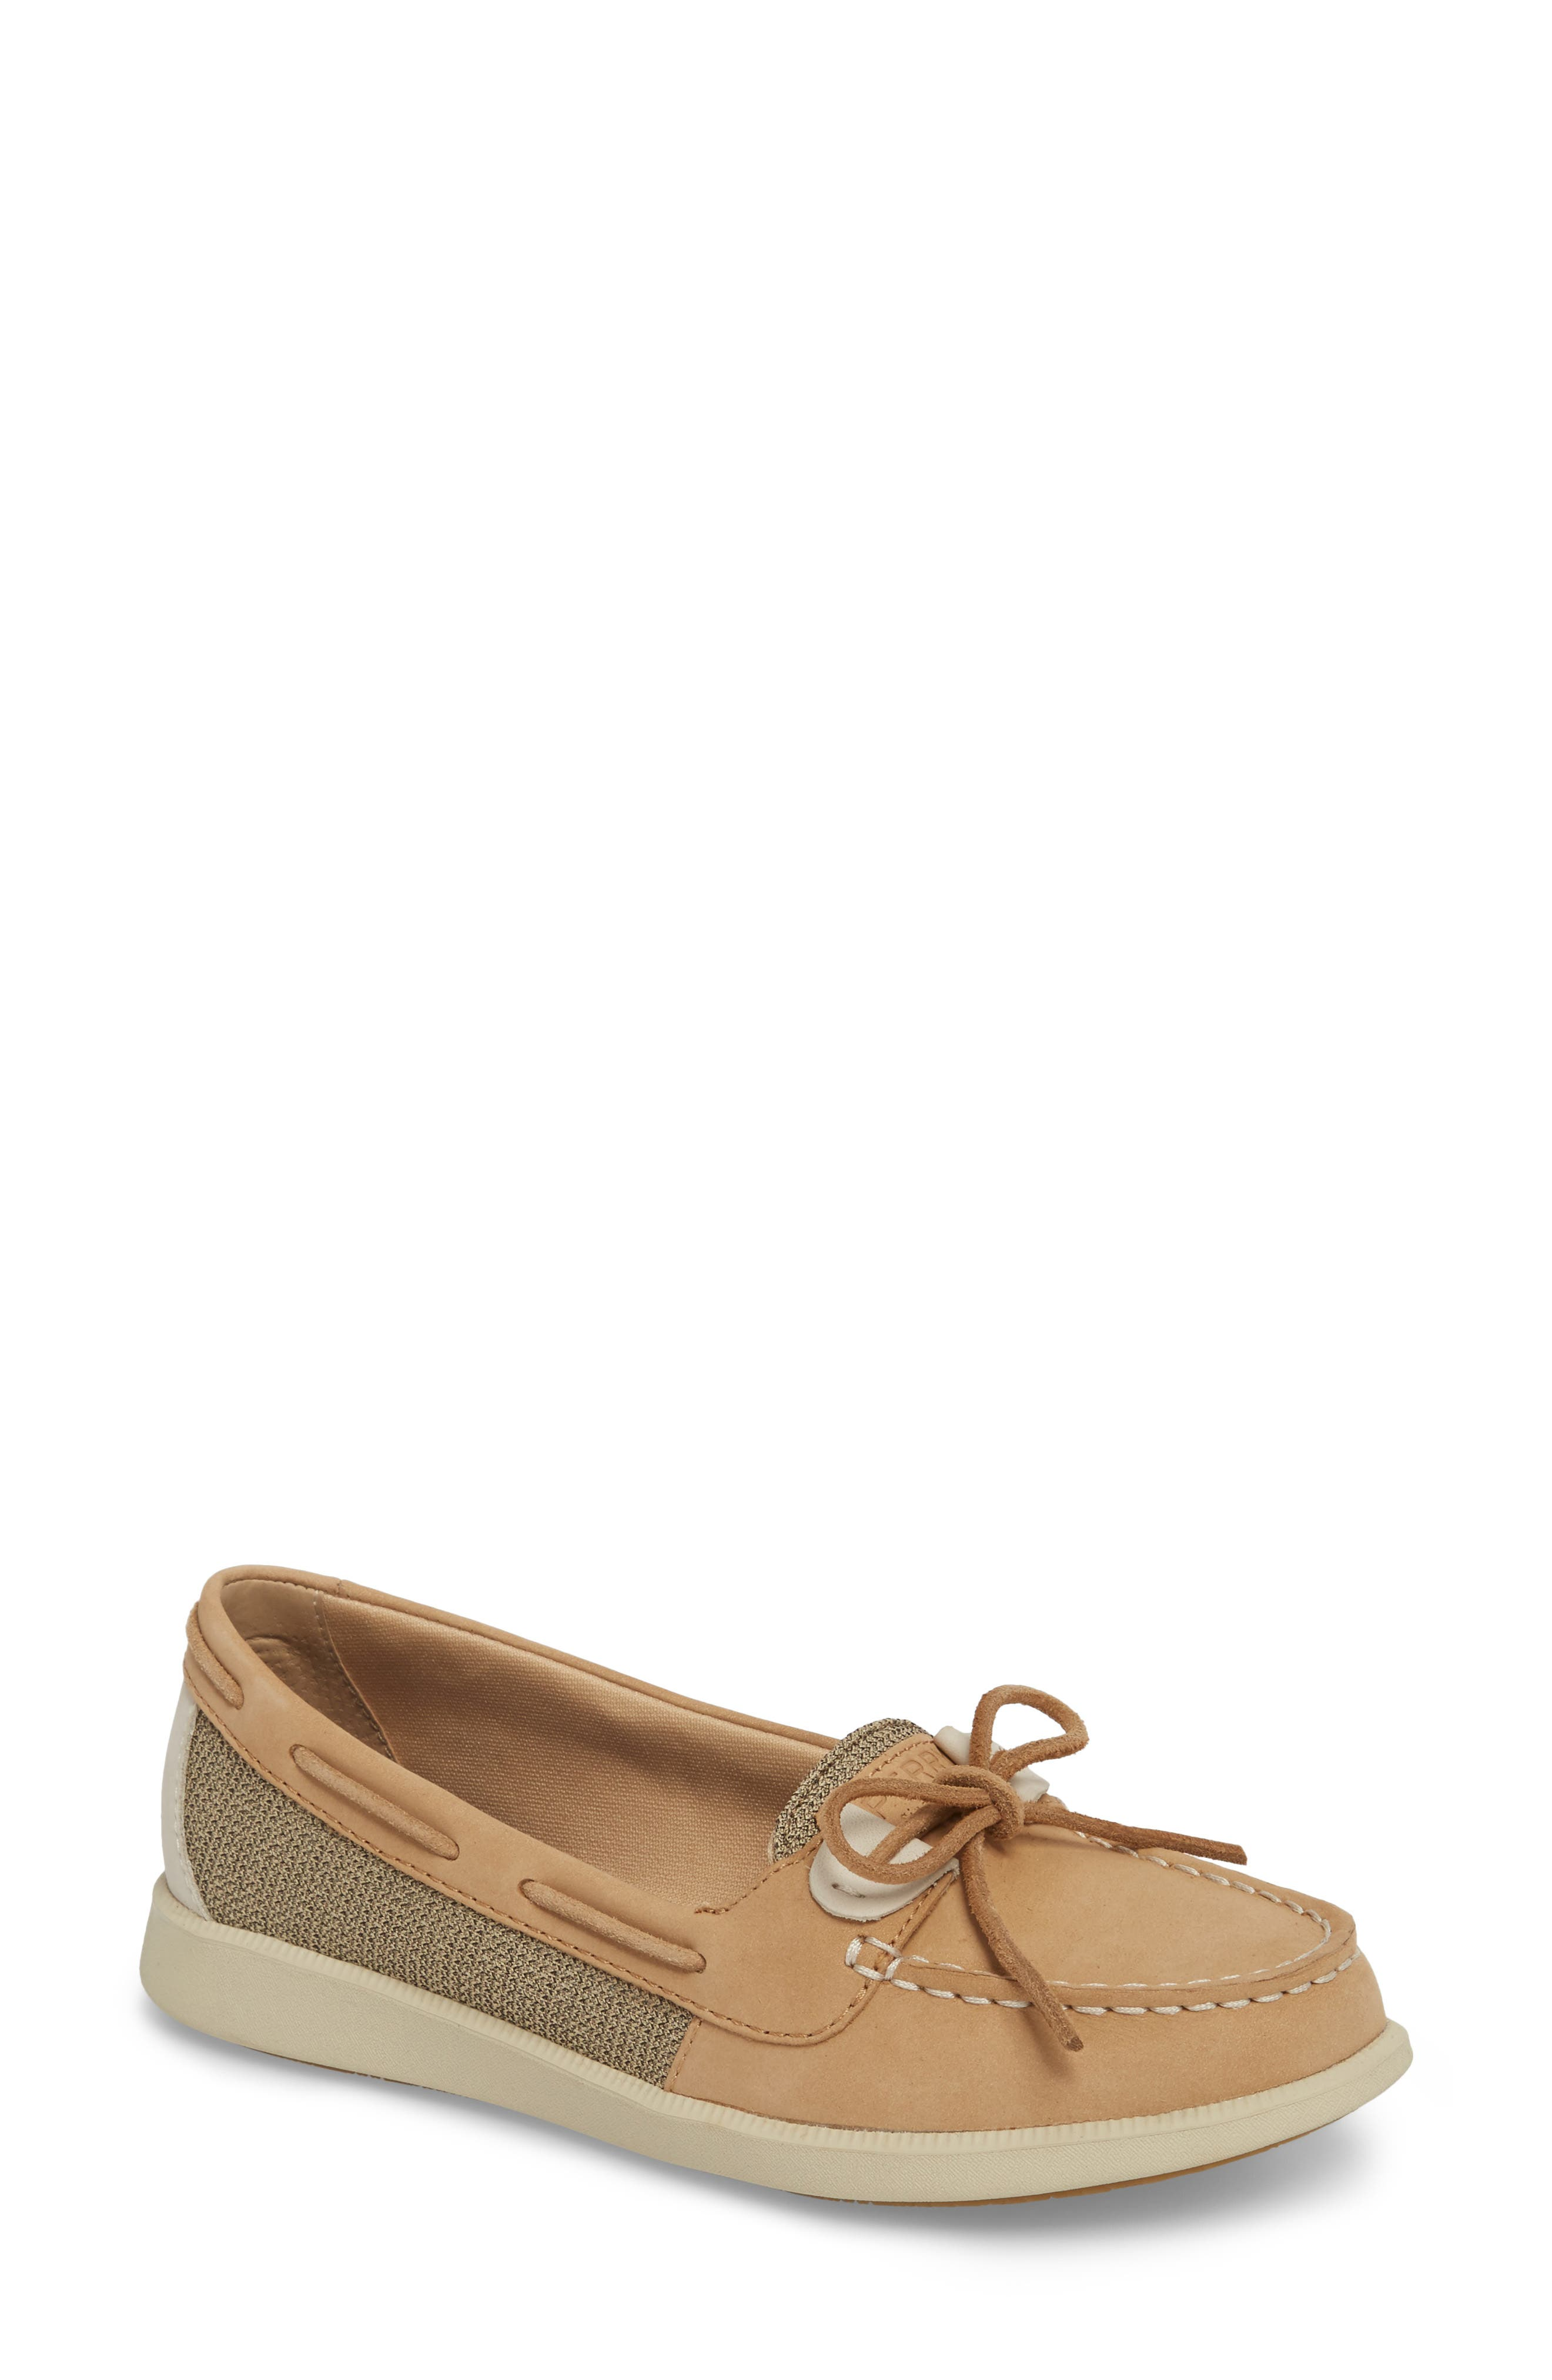 Oasis Boat Shoe,                             Main thumbnail 1, color,                             LINEN OAT LEATHER